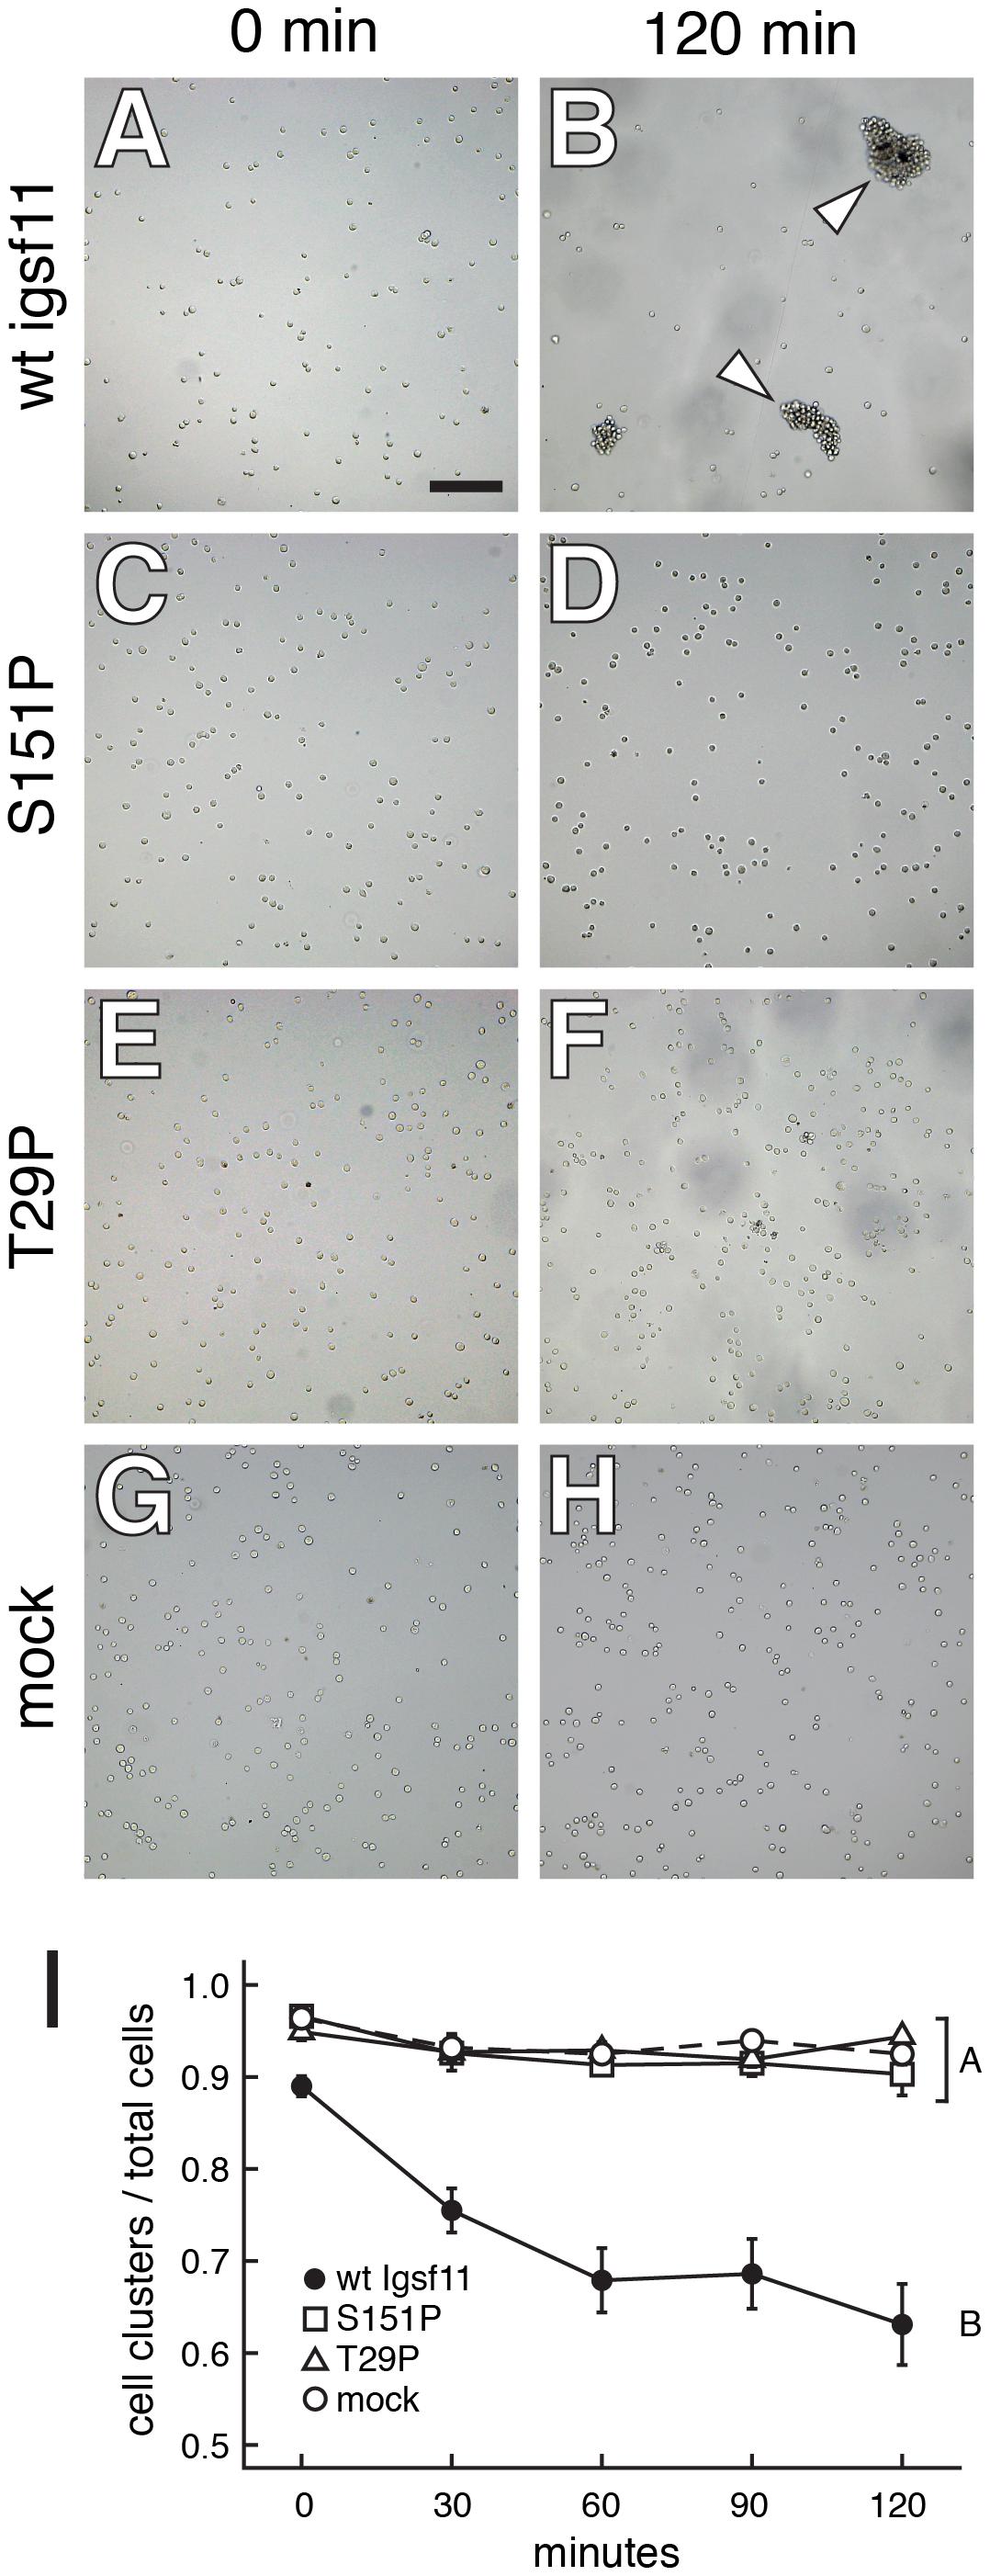 Igsf11 promotes aggregation of K562 myeloid leukemia cells in vitro.